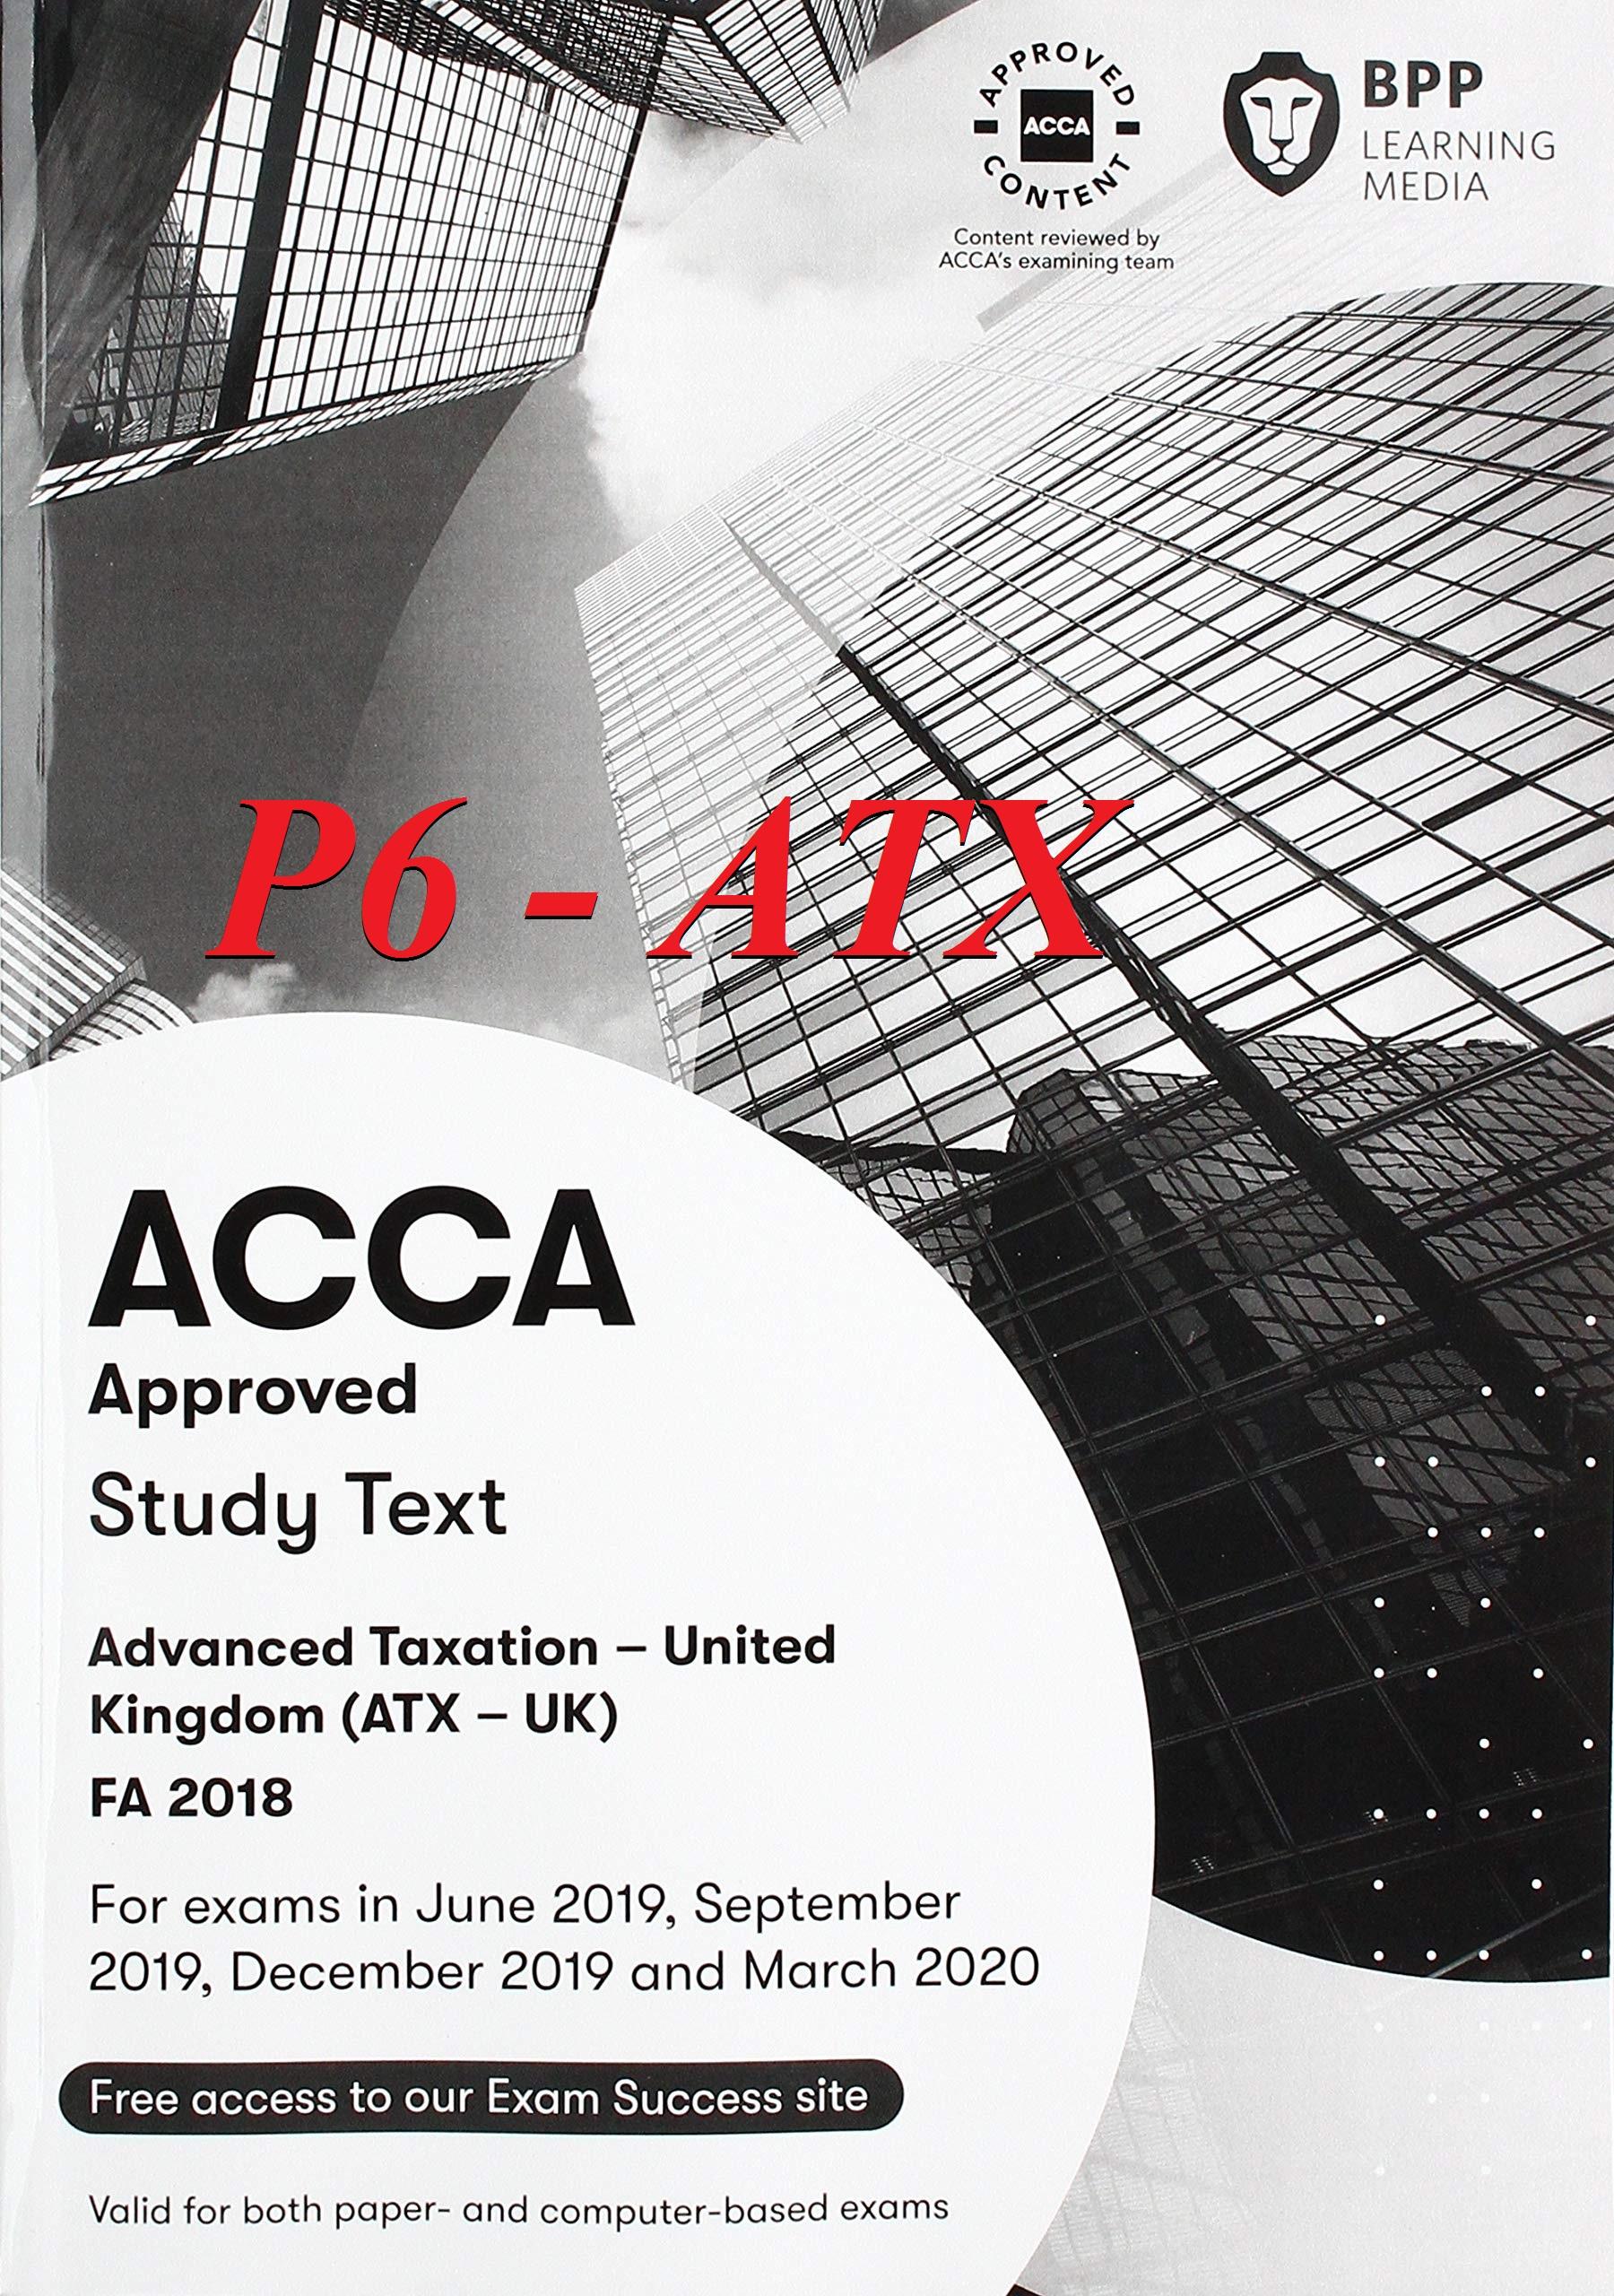 Tài Liệu ACCA P6 2020 (ATX) Advanced Taxation